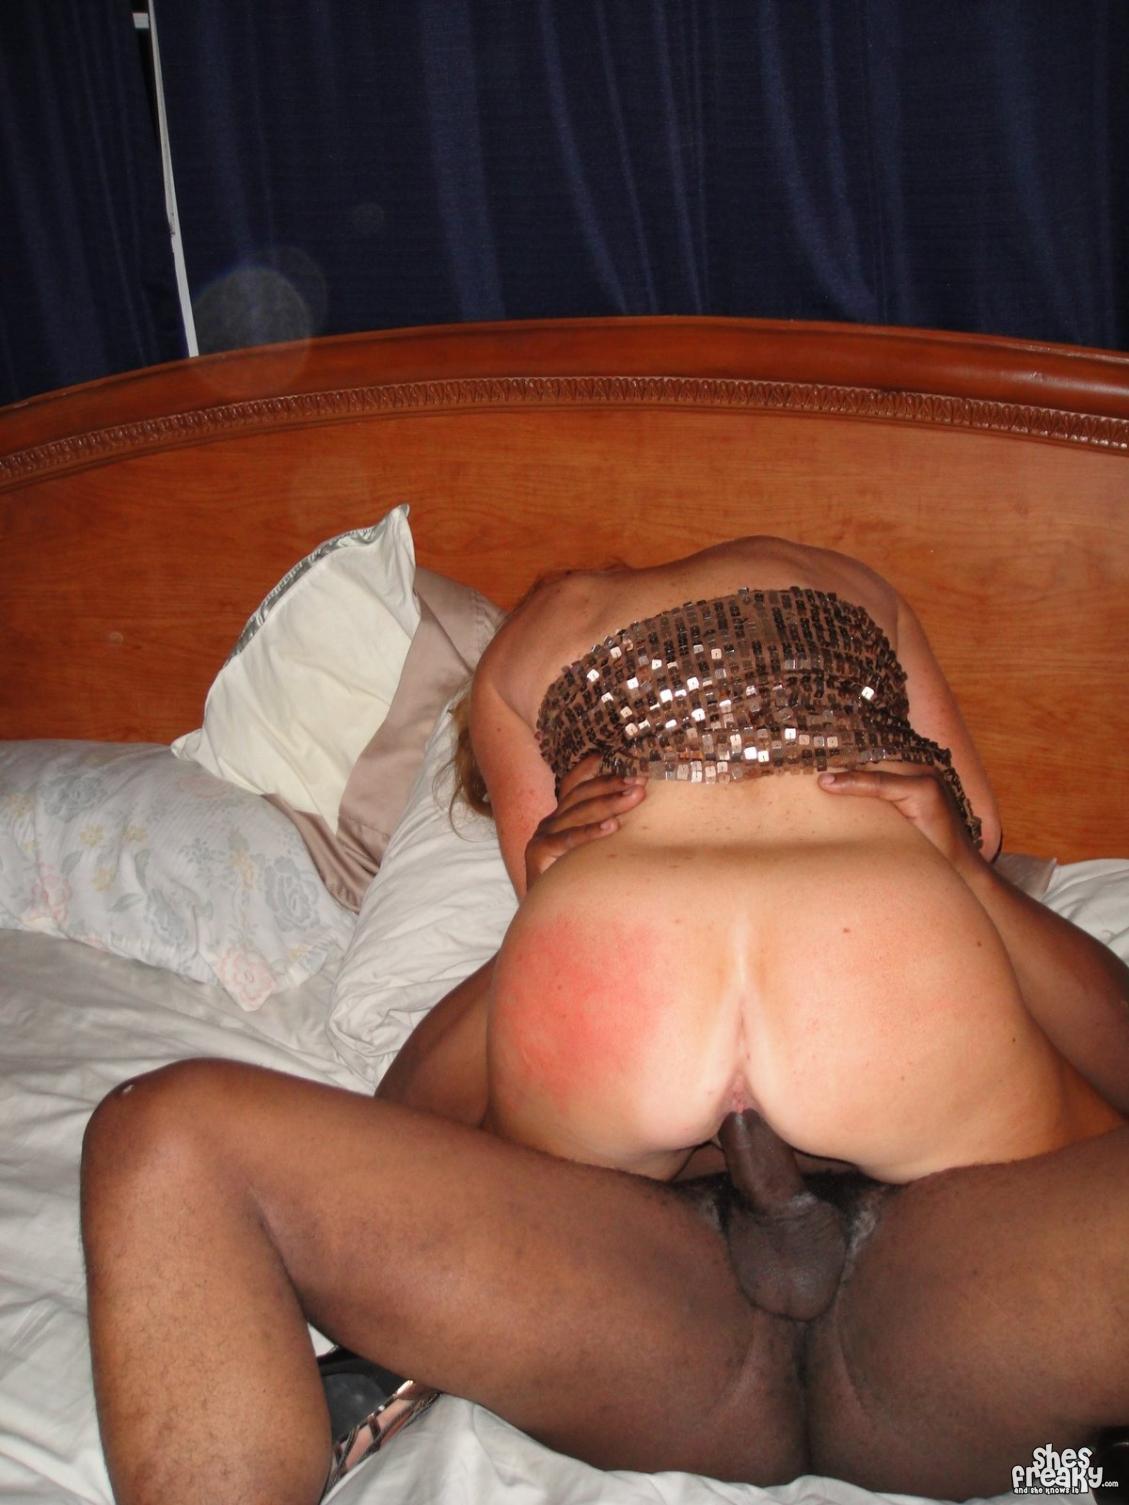 XXX photo Bdsm spanking iowa fetish